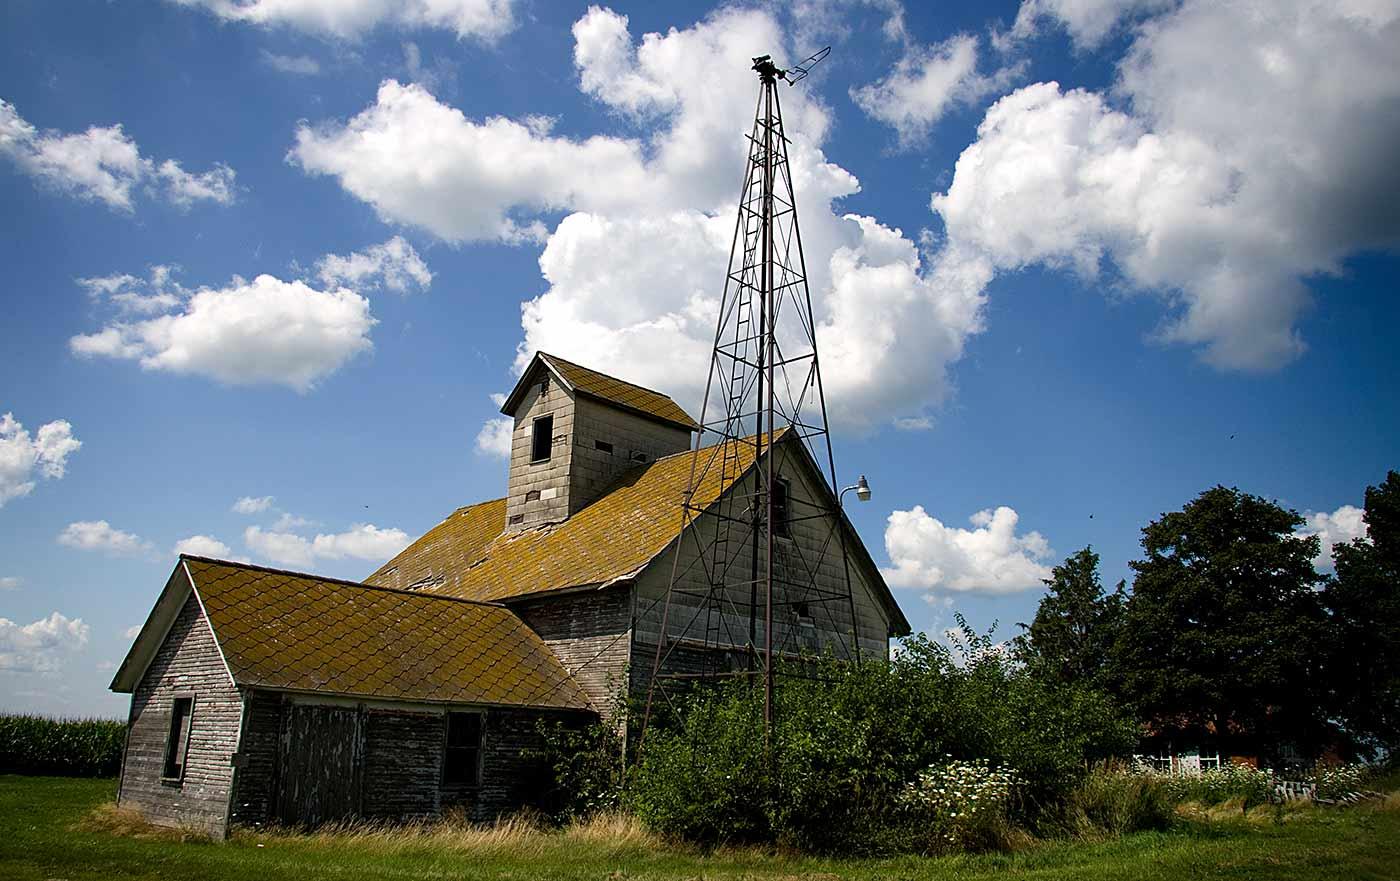 Illinois farm house